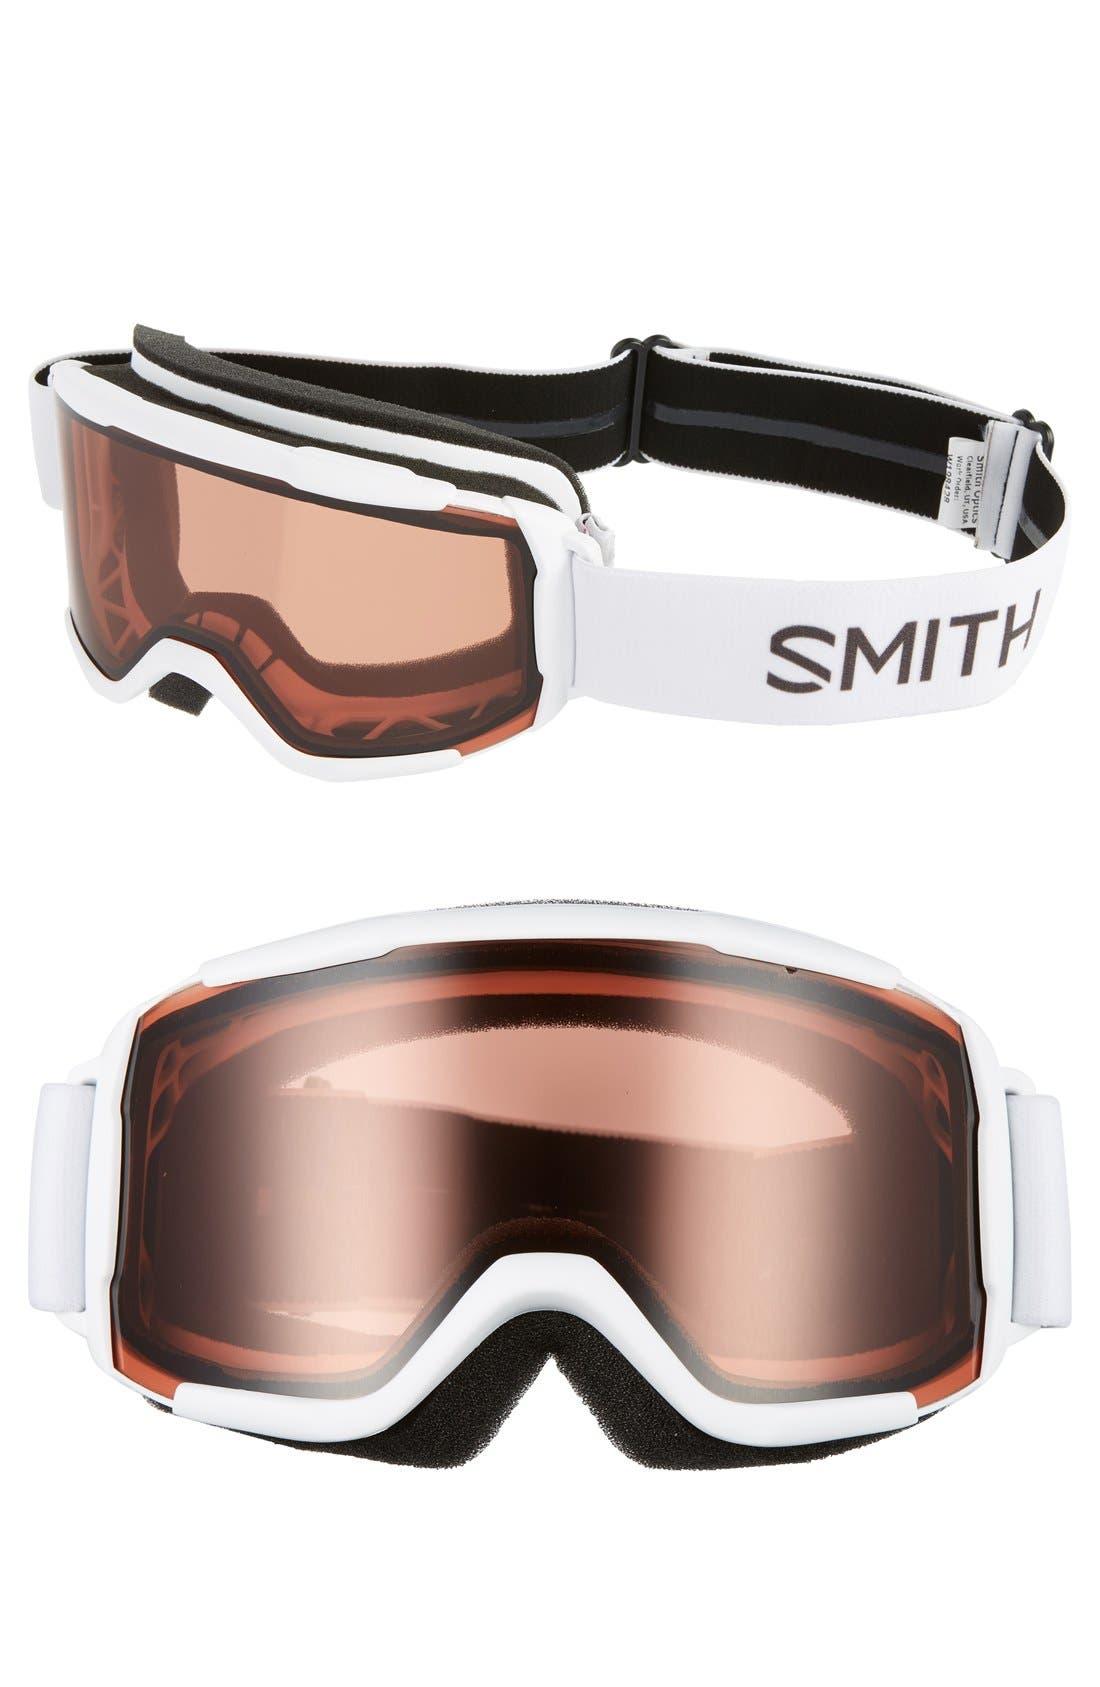 Smith 'Daredevil' Snow Goggles (Girls)